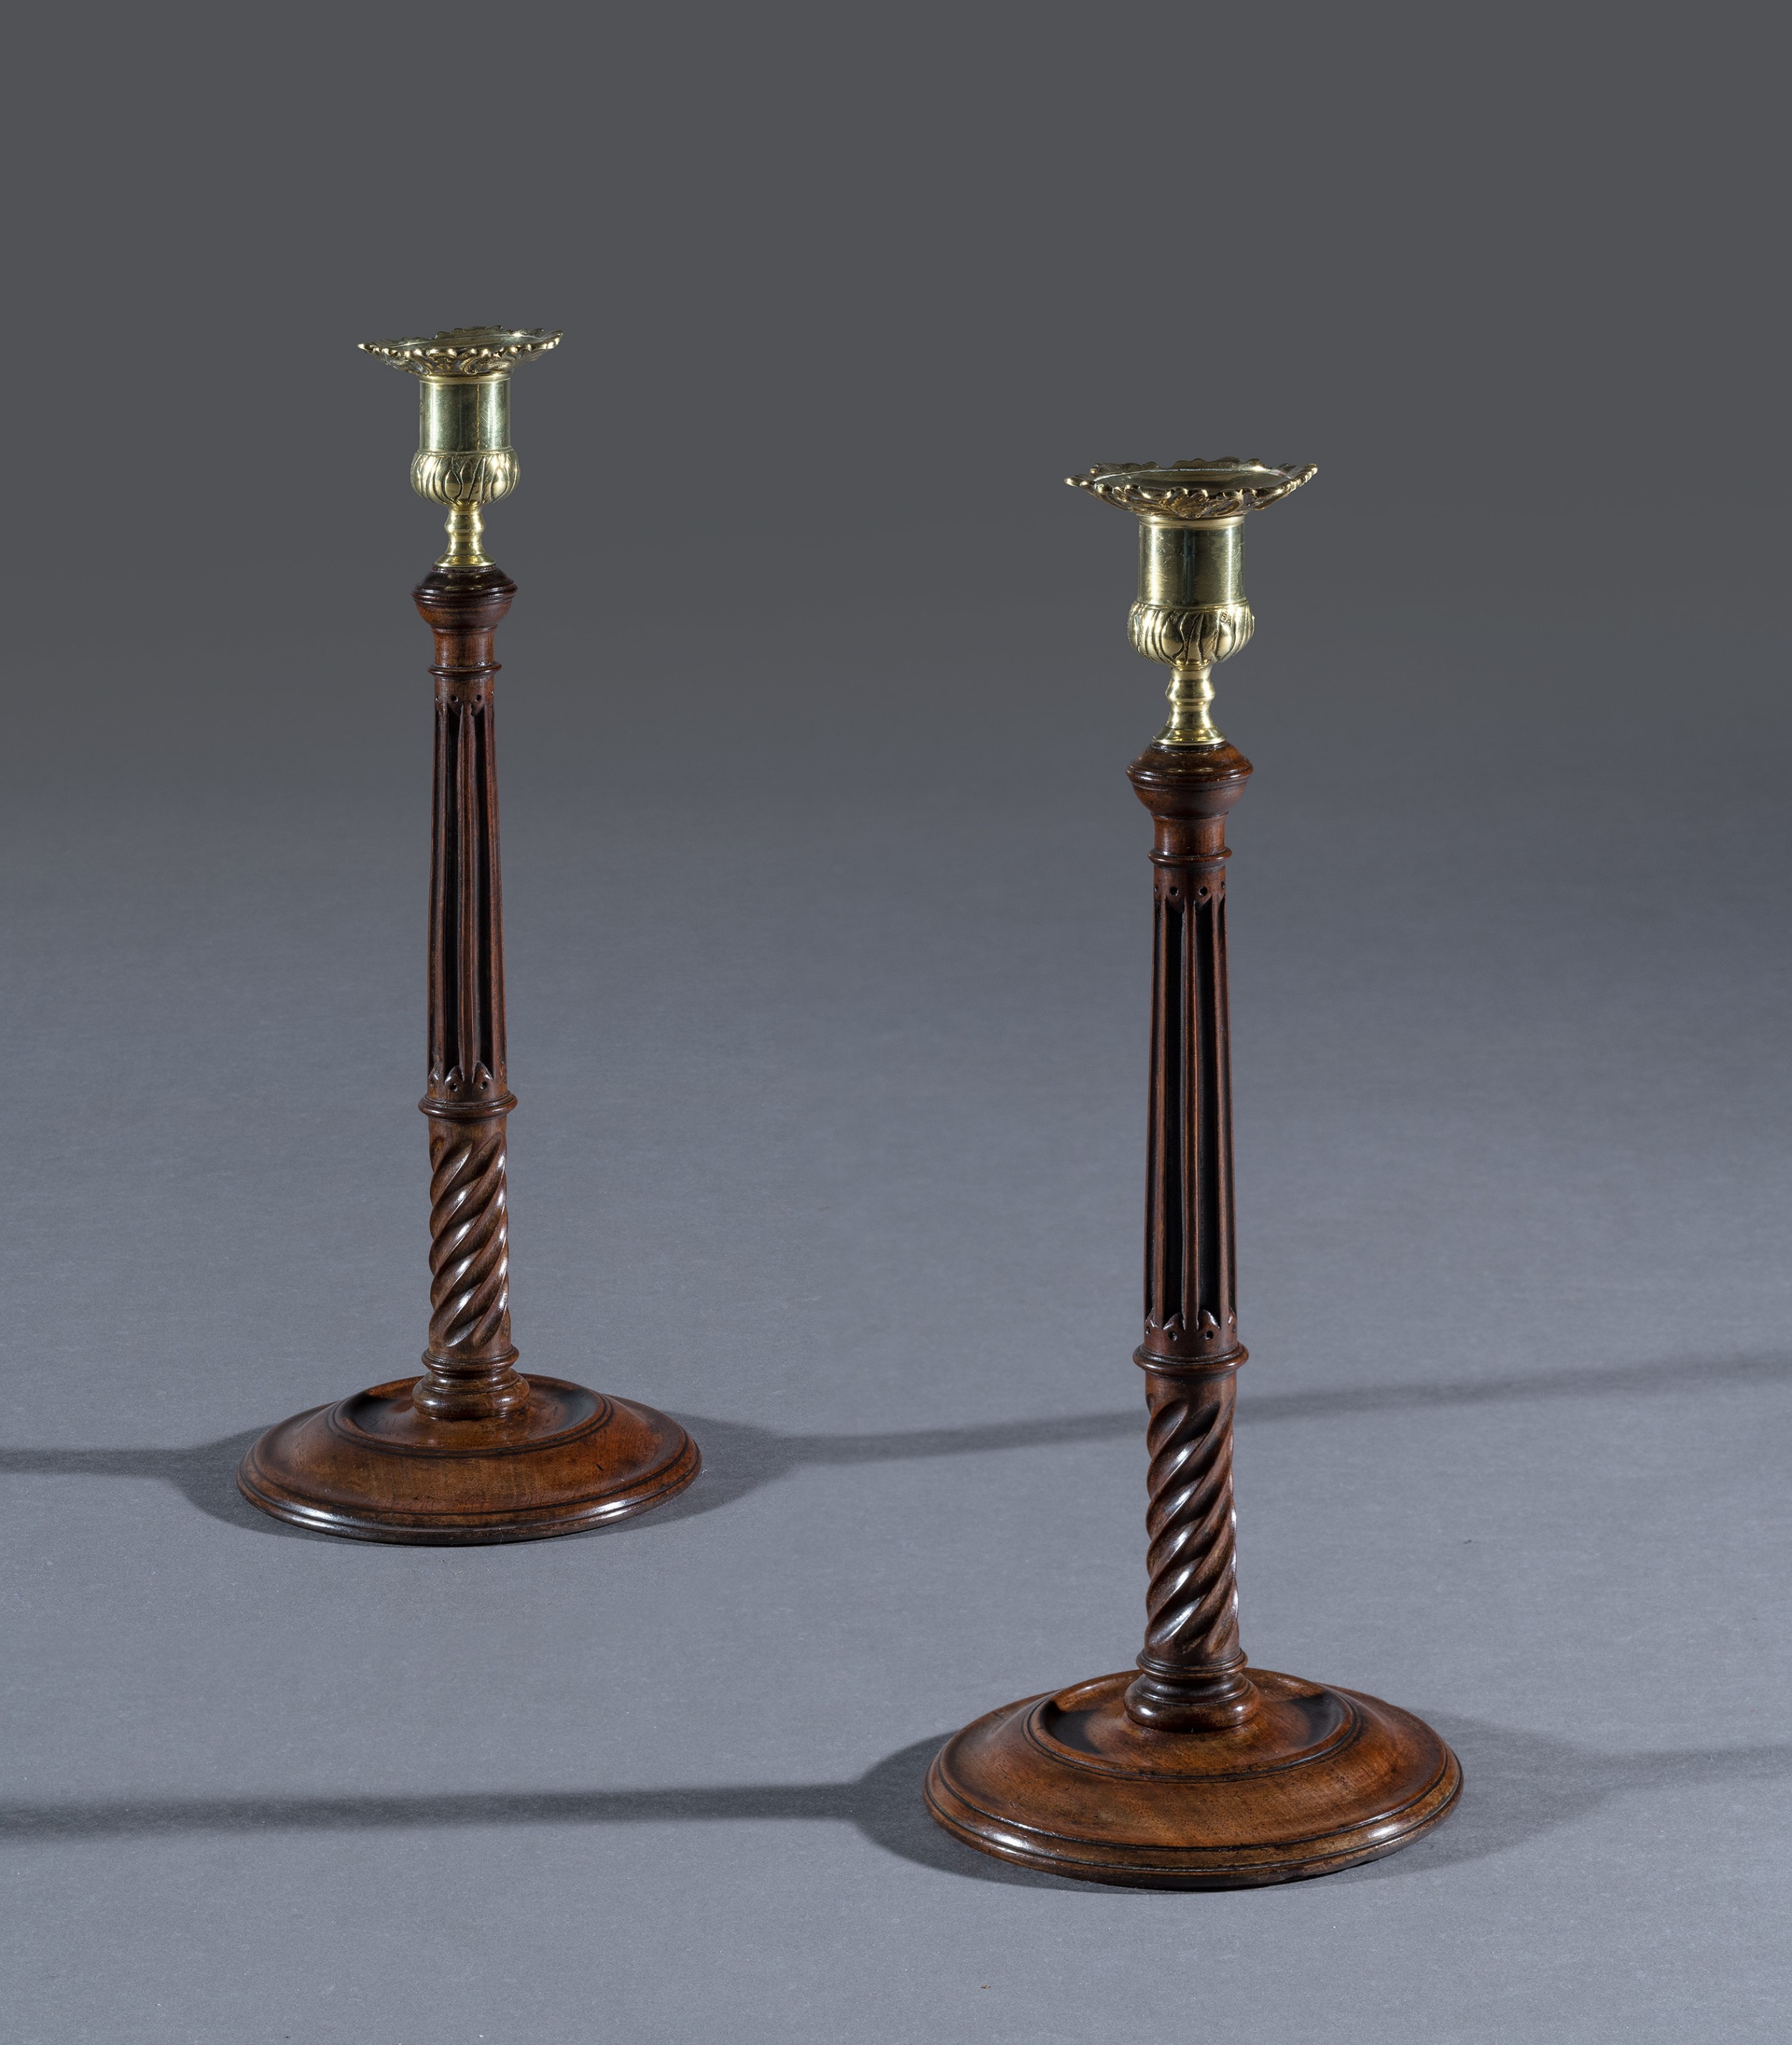 pair of 18th century mahogany candlesticks